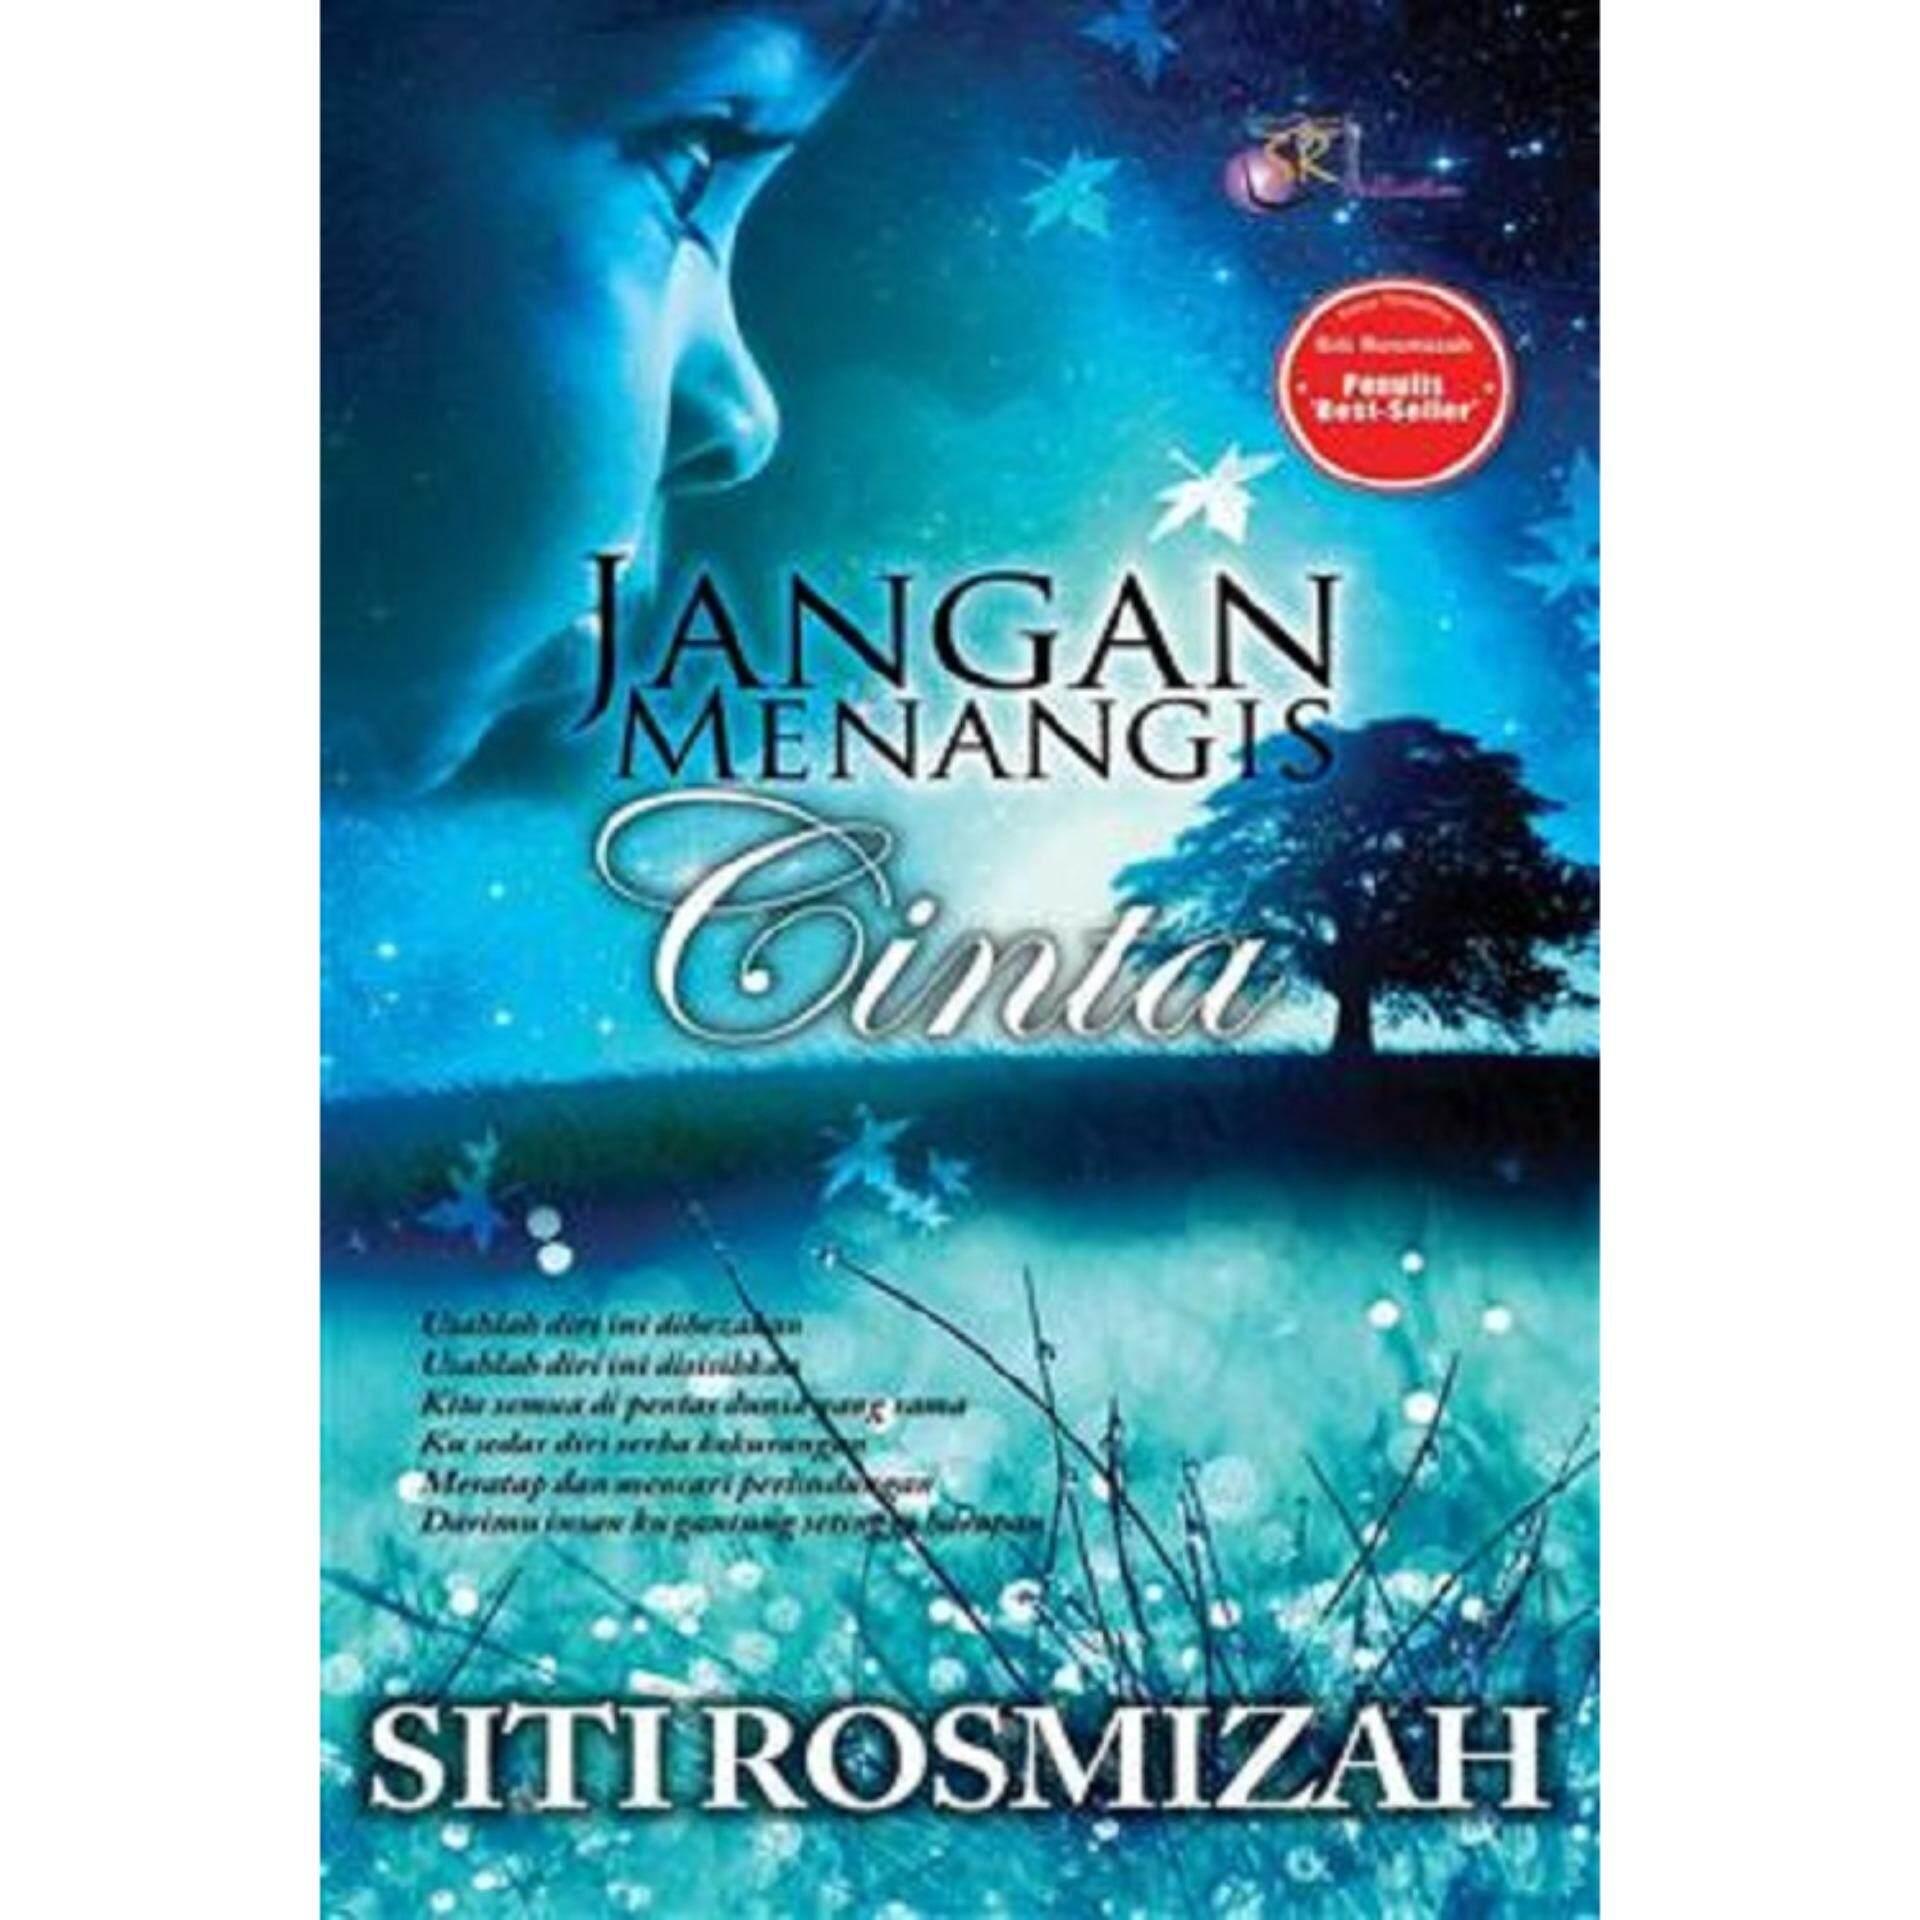 Jangan Menangis Cinta - Isbn 9789675822537 Author Siti Rosmizah By Mph Bookstores.